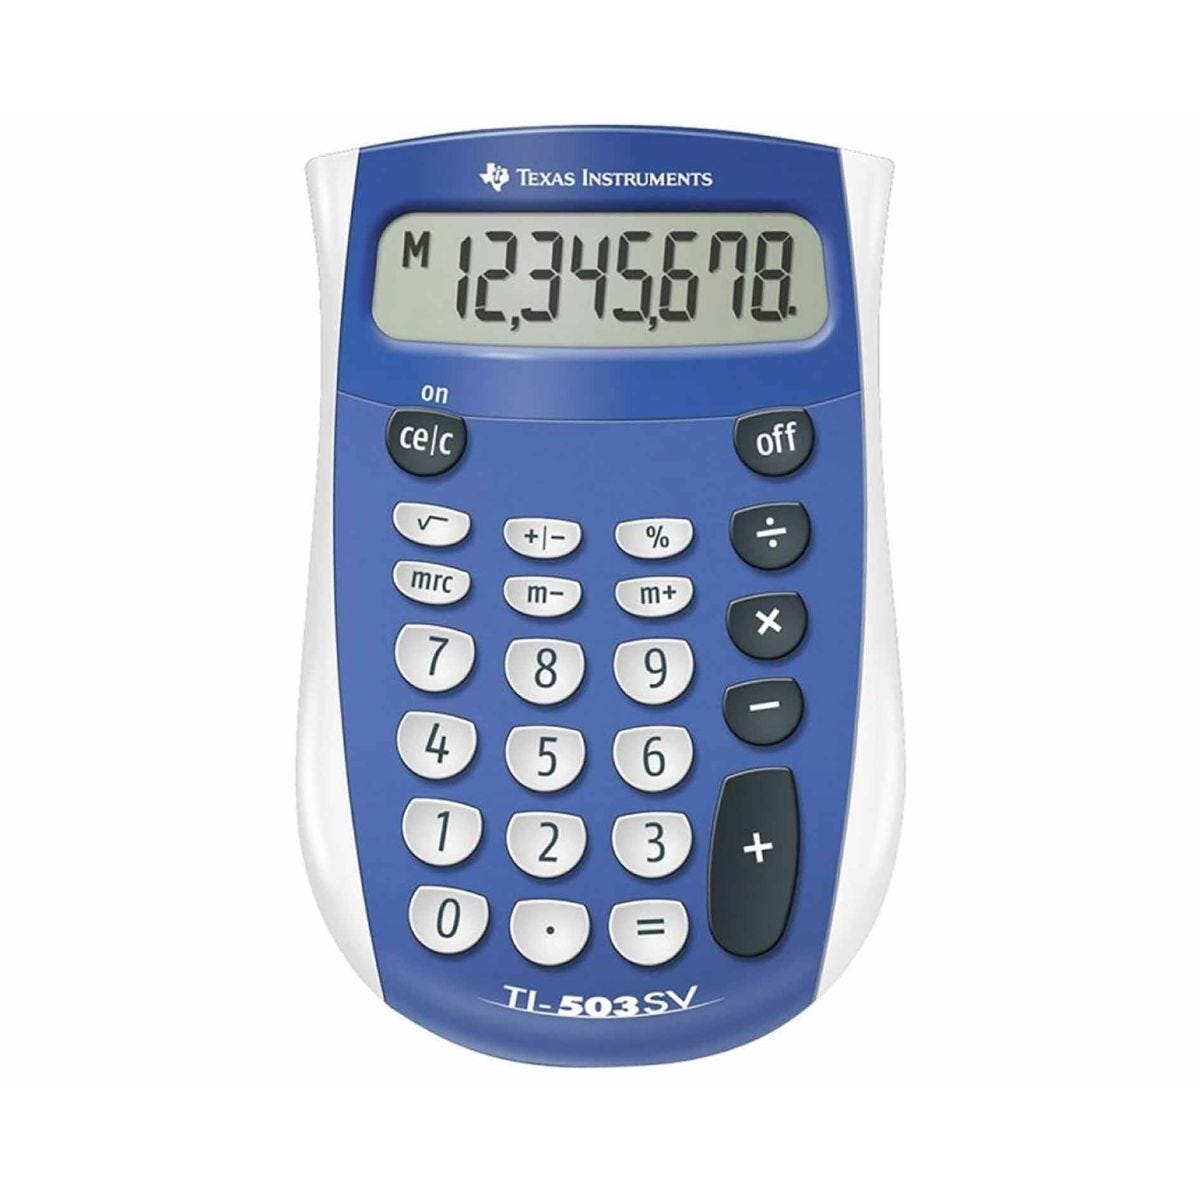 Texas Instrument TI503SV Pocket Calculator